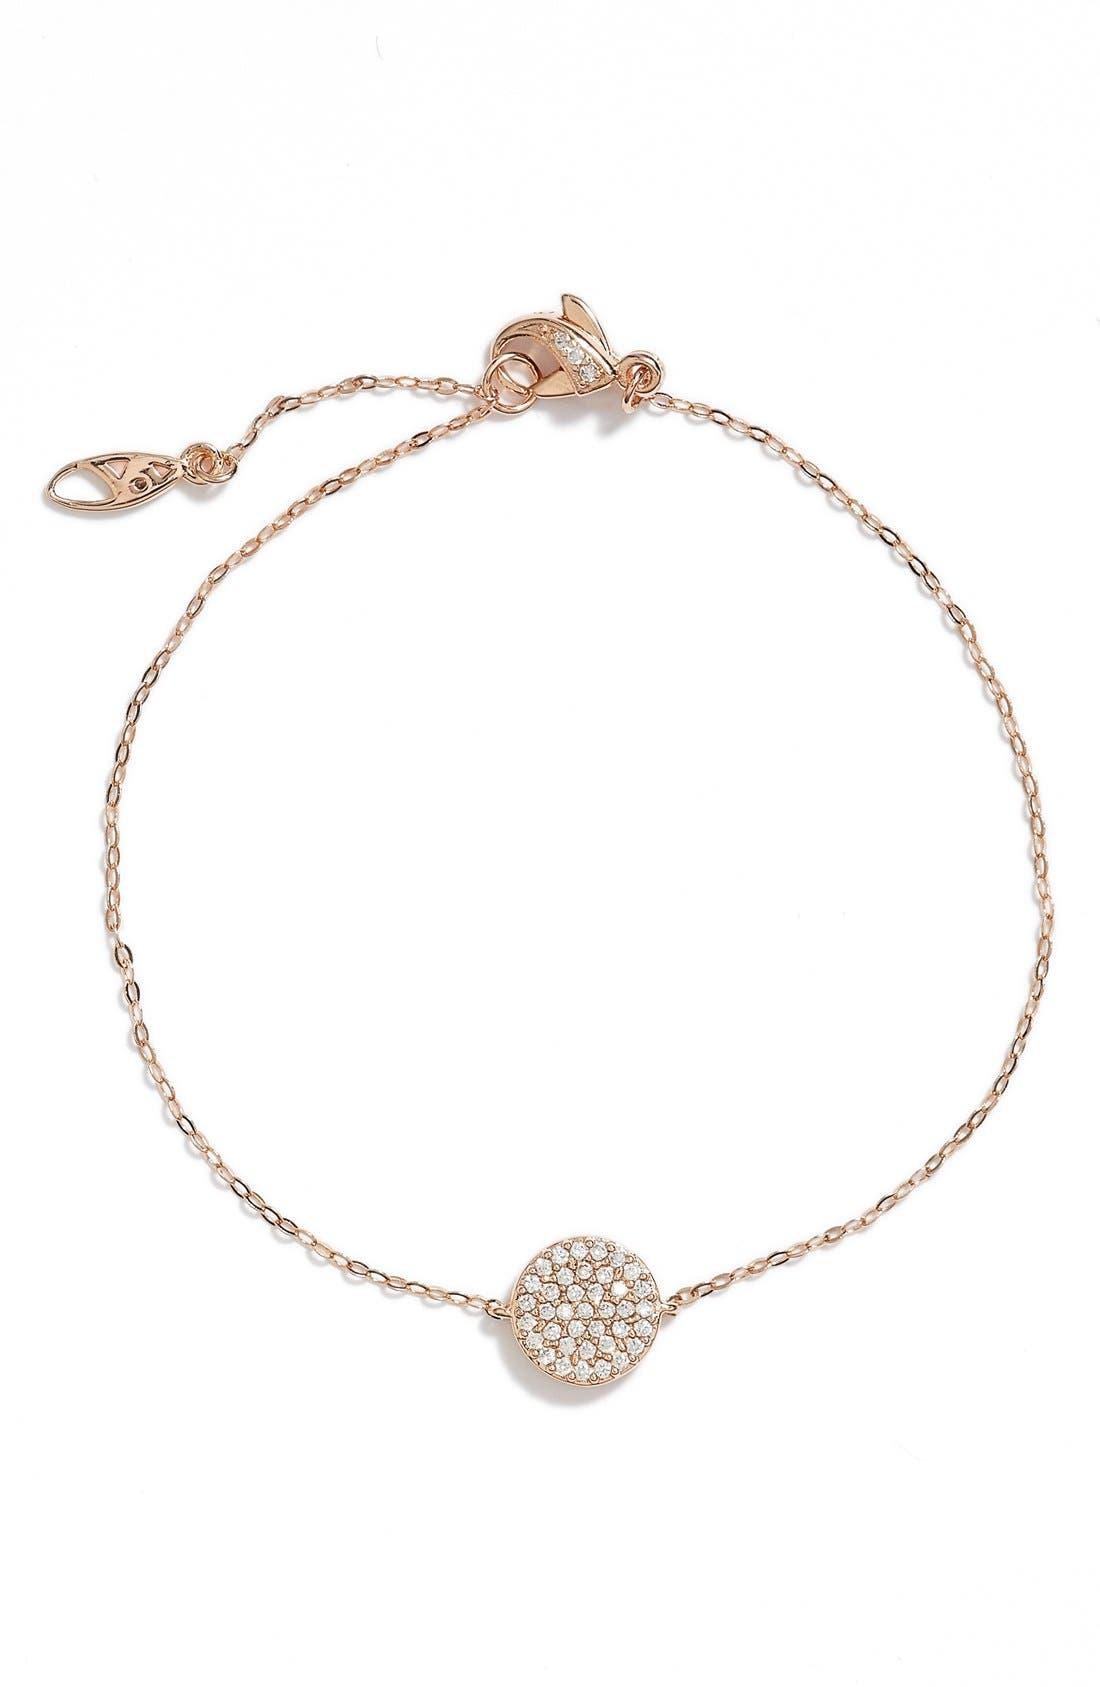 Main Image - Nadri 'Geo' Station Bracelet